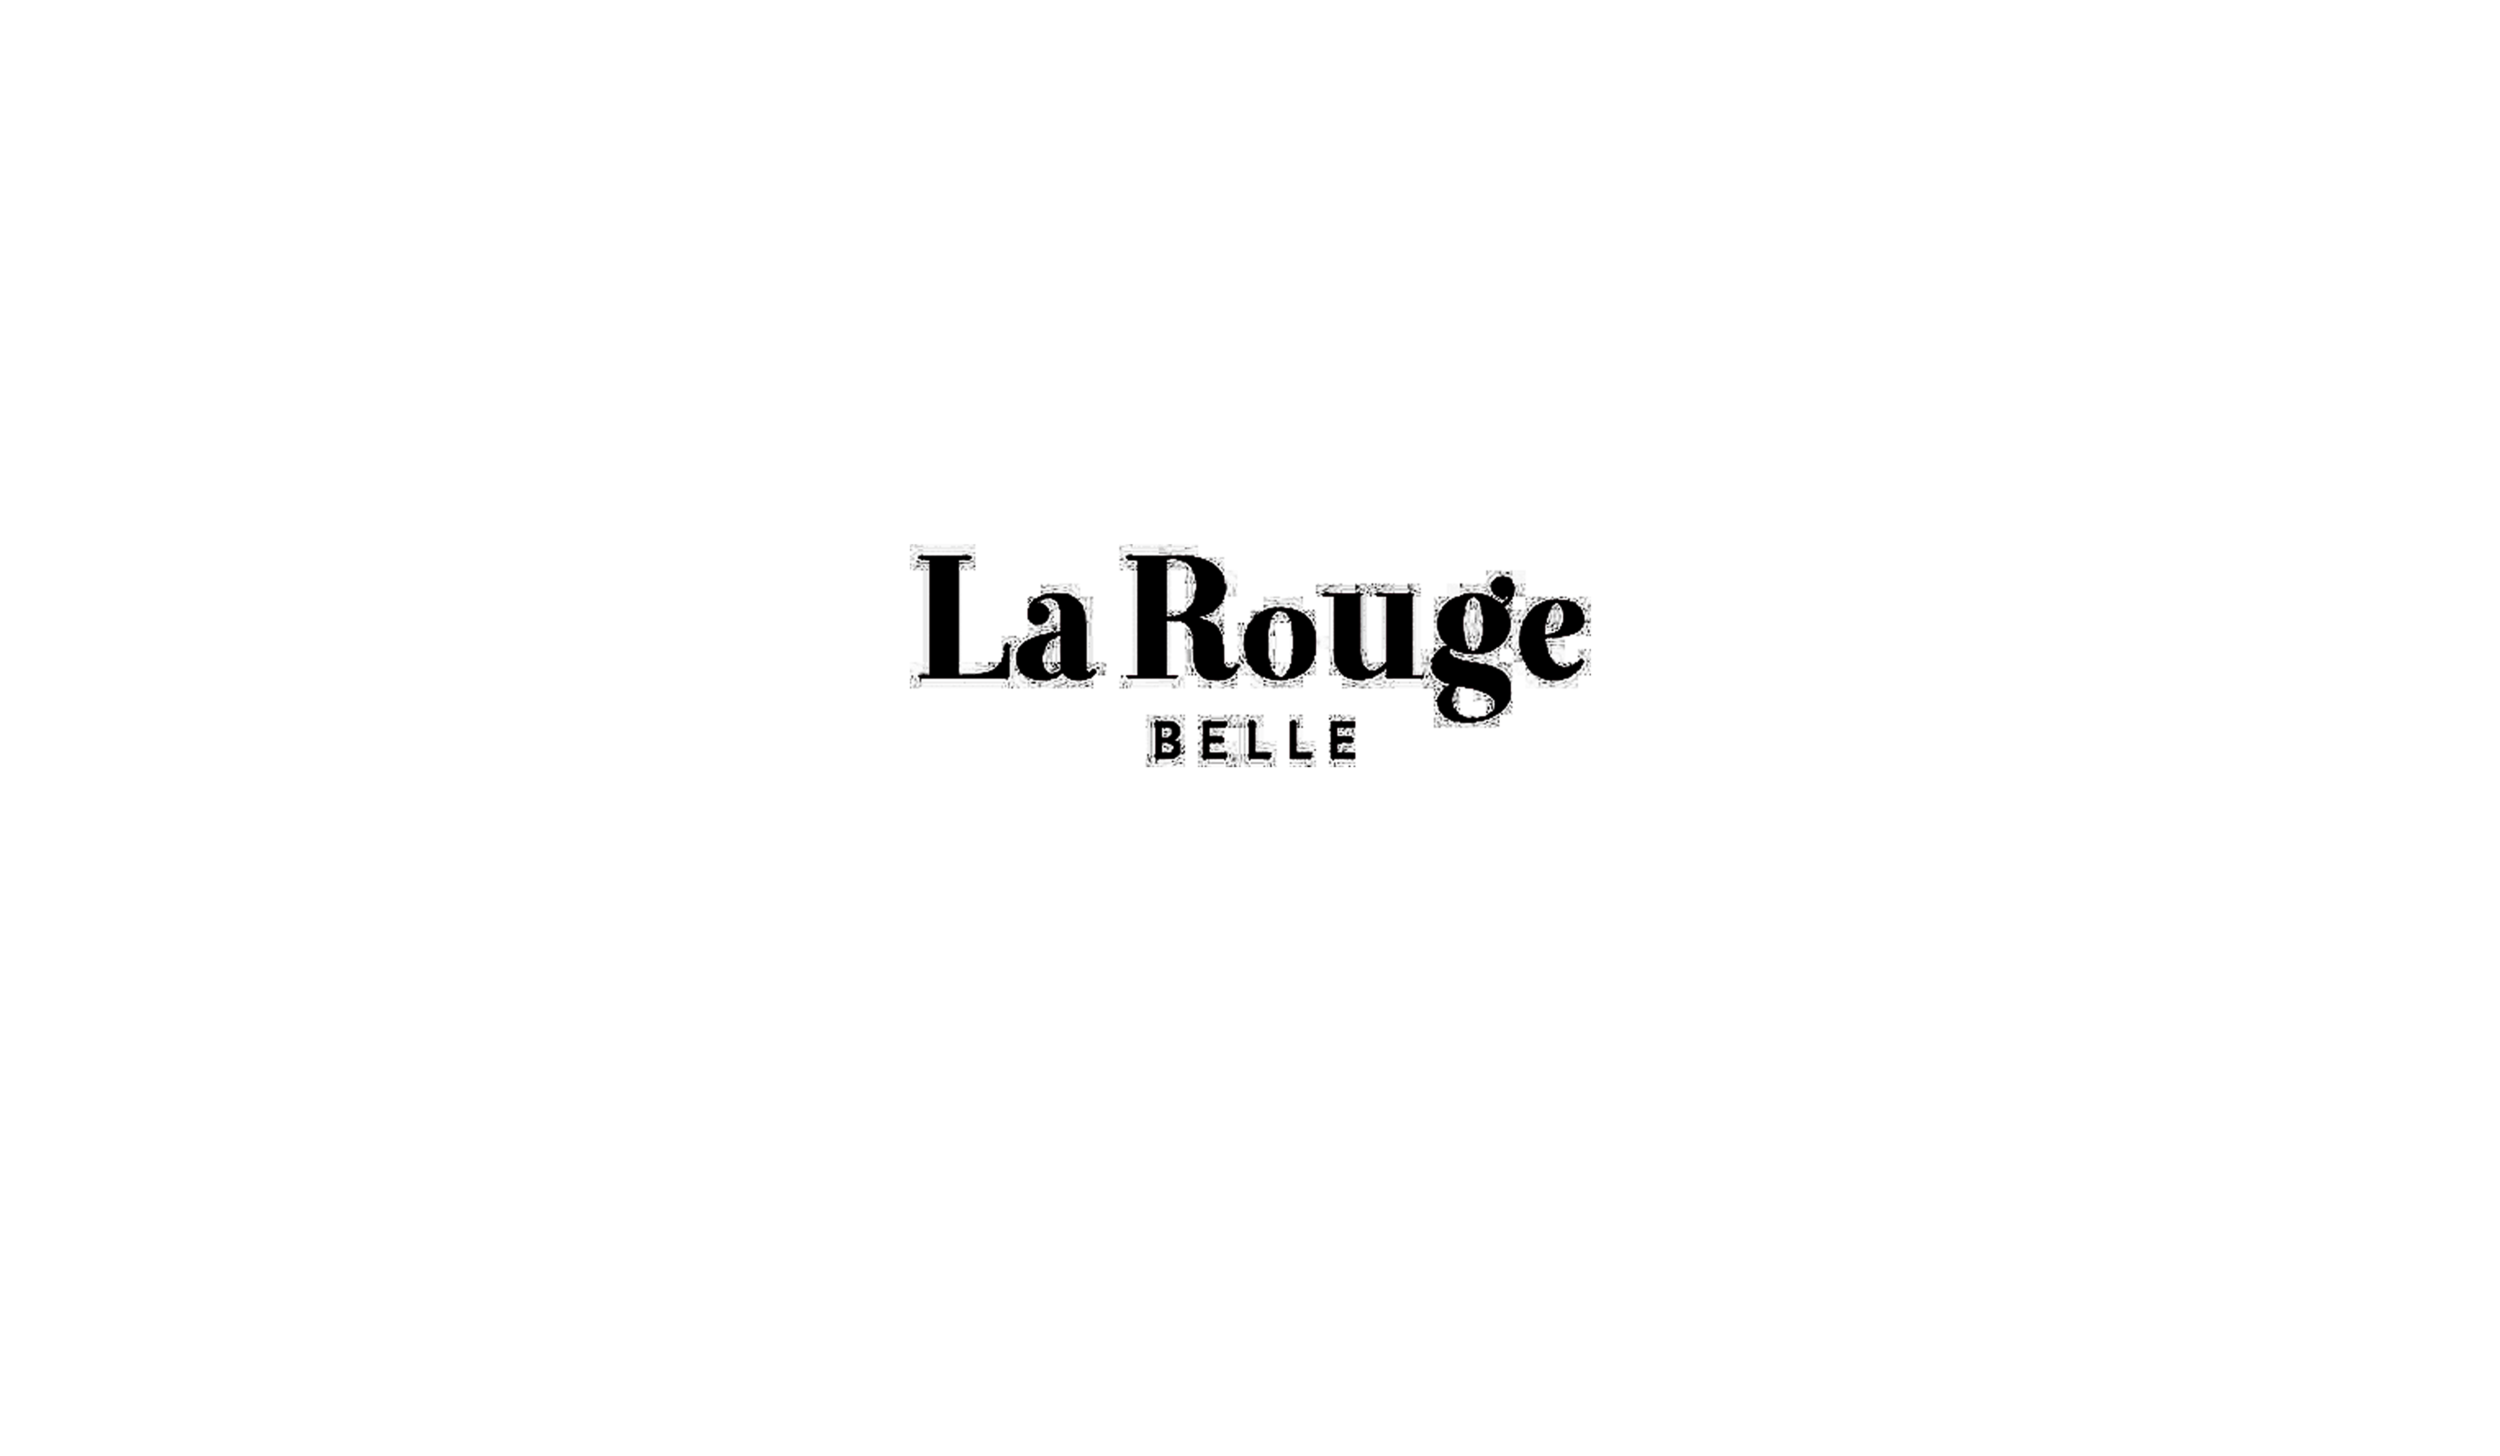 Untitled1-copy_0009_LAROUGE_logo_corel-01.jpg.png